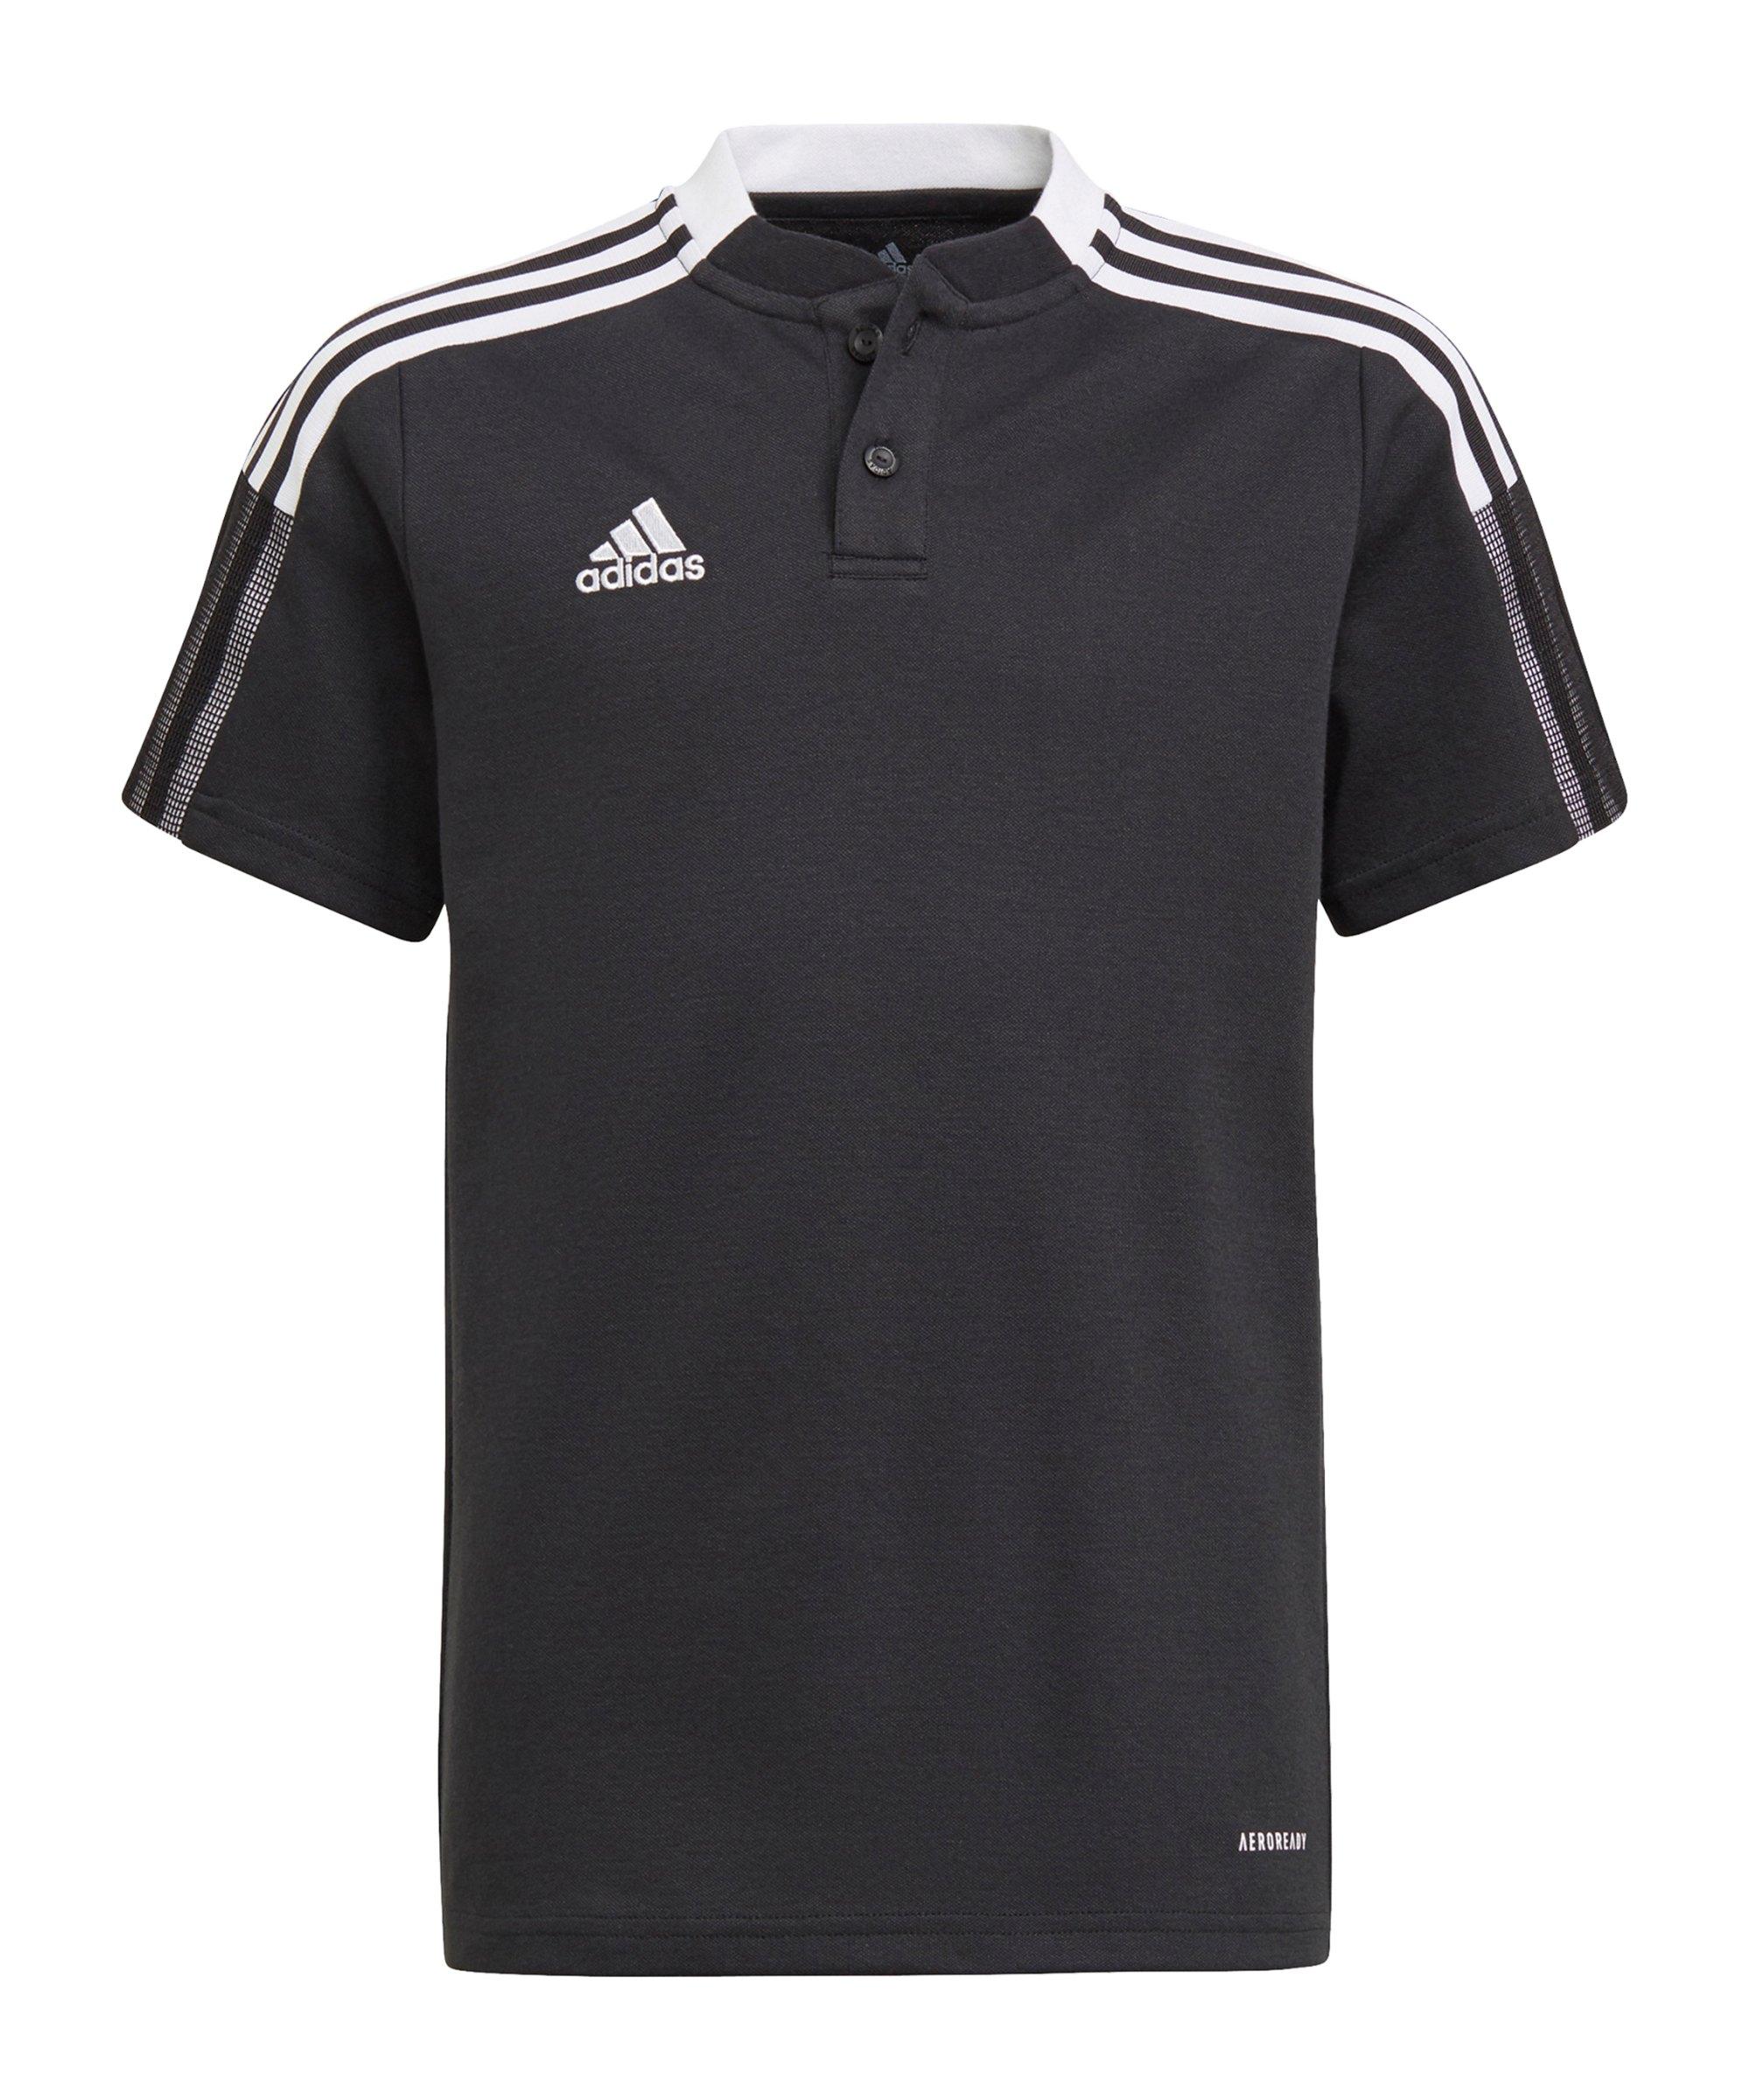 adidas Tiro 21 Poloshirt Kids Schwarz - schwarz